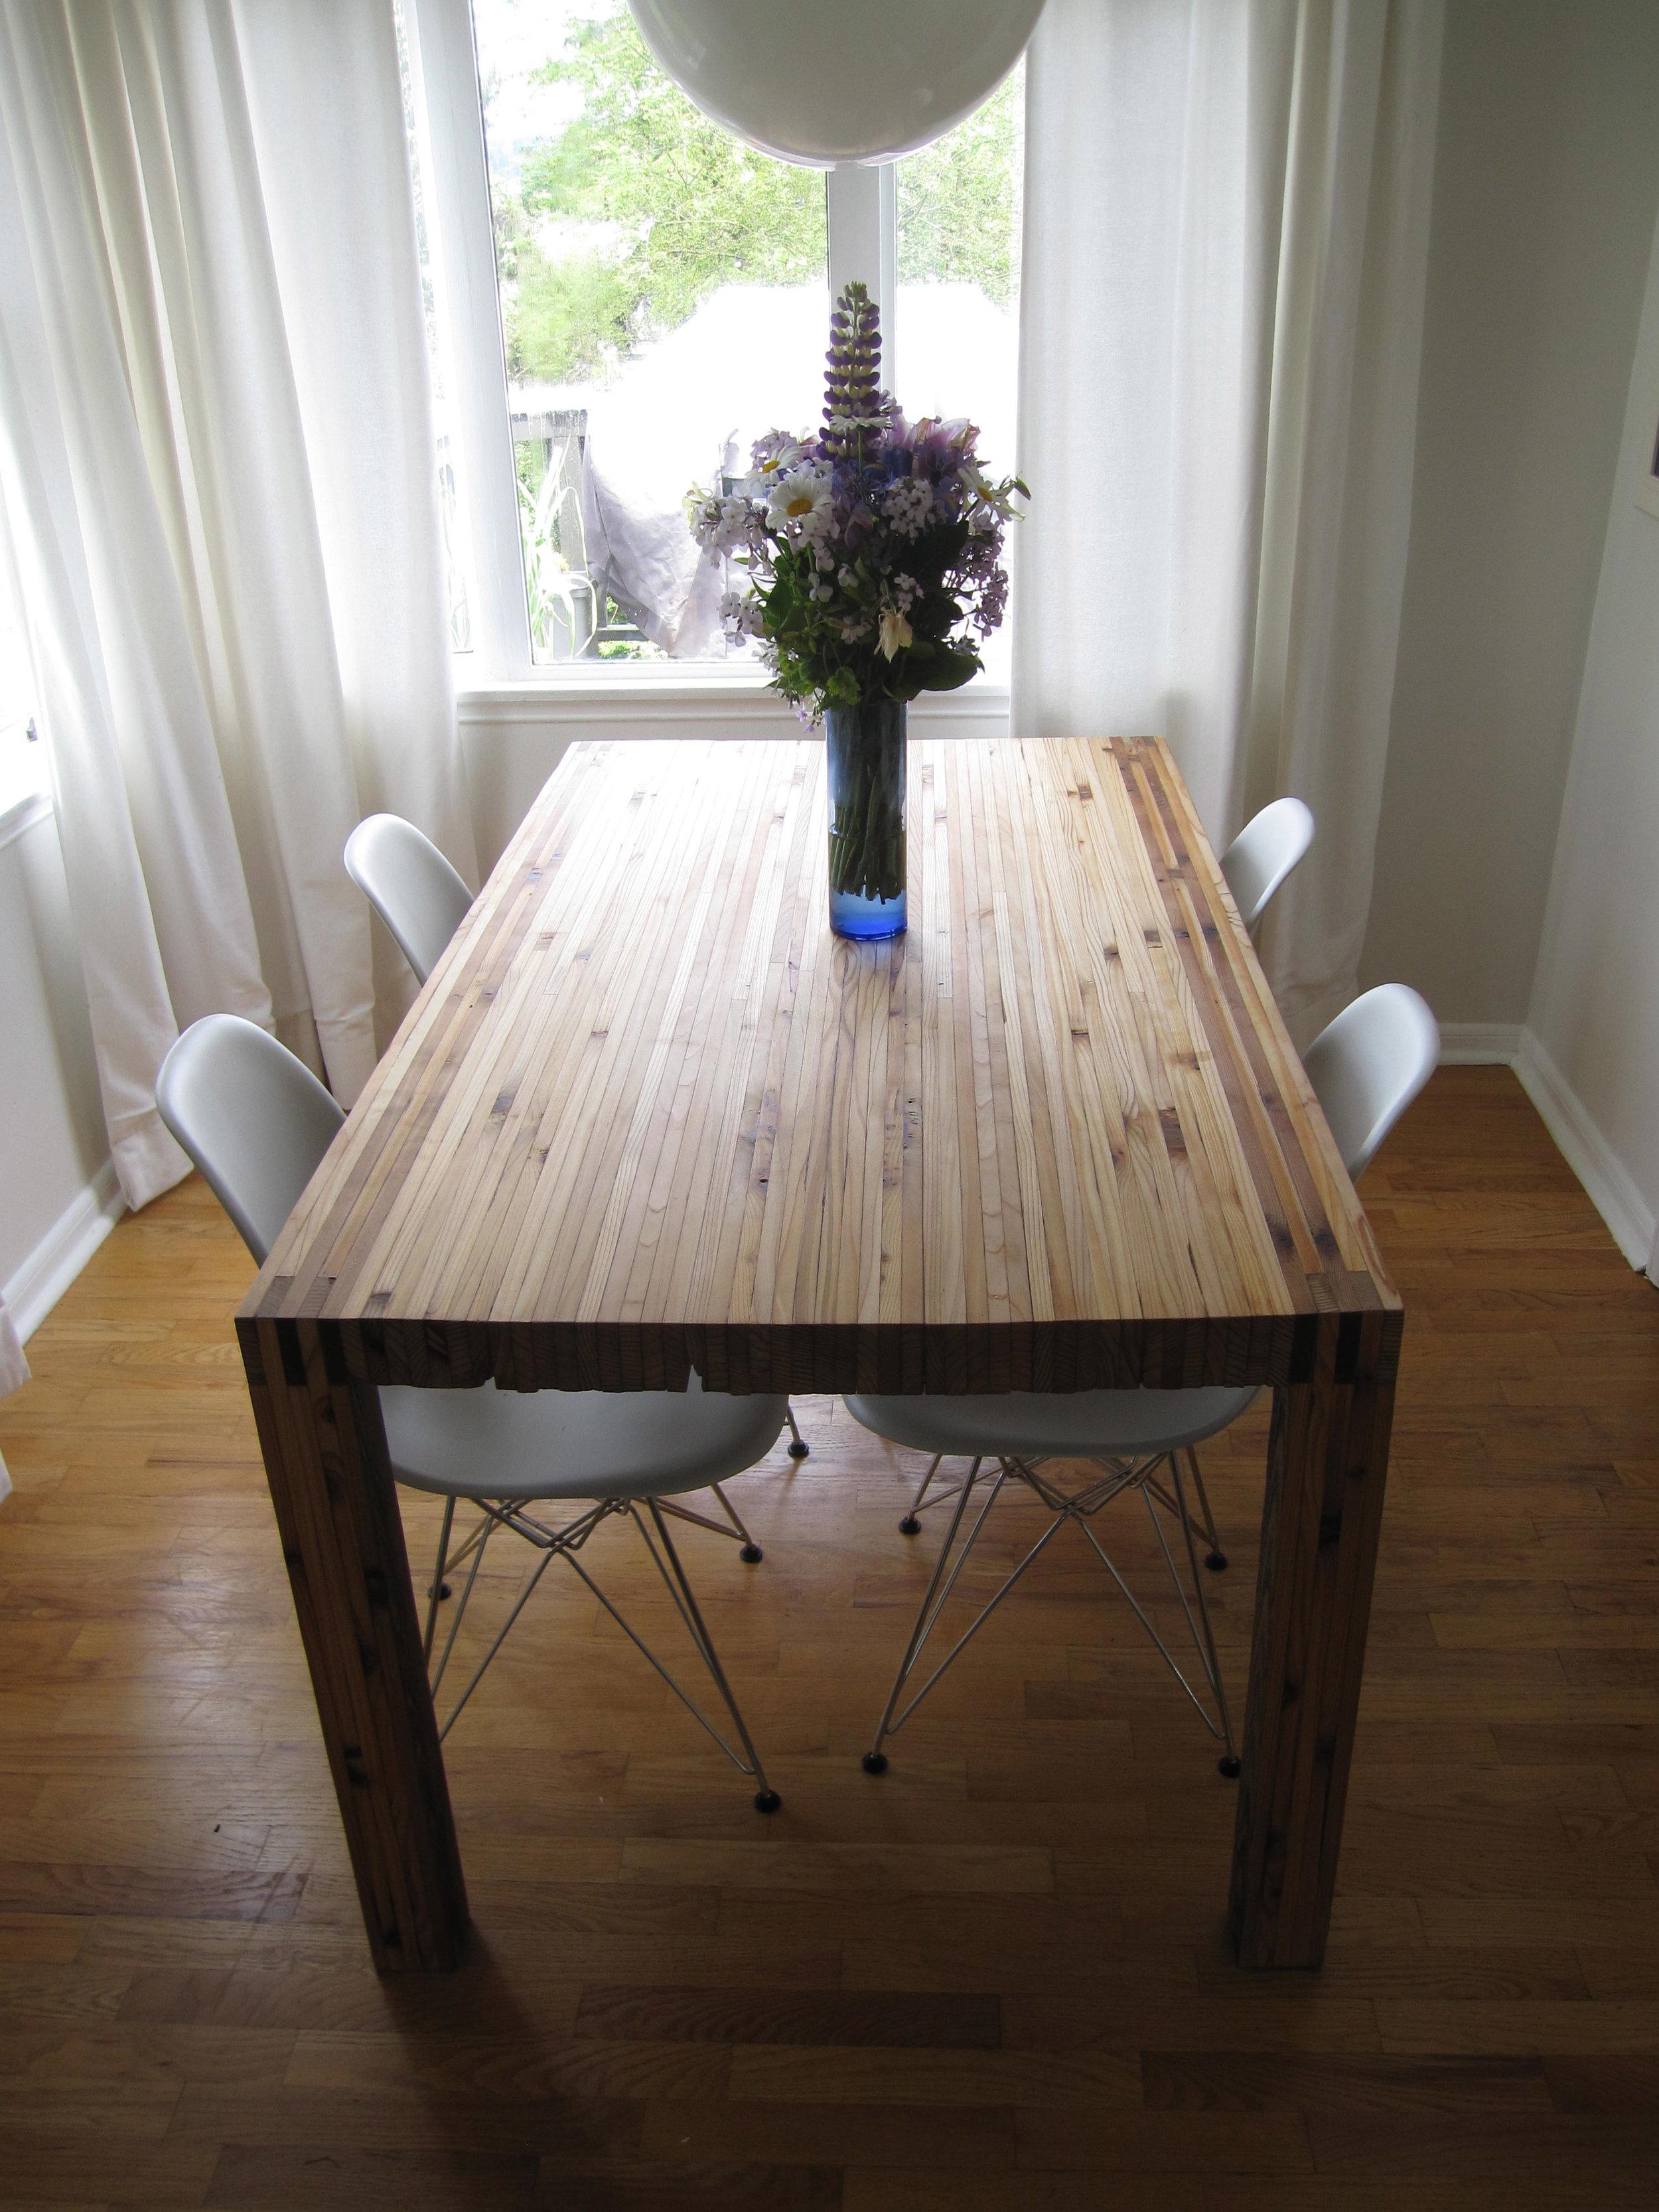 table-in-michael-and-kari-lises-dining-room_7243257060_o.jpg